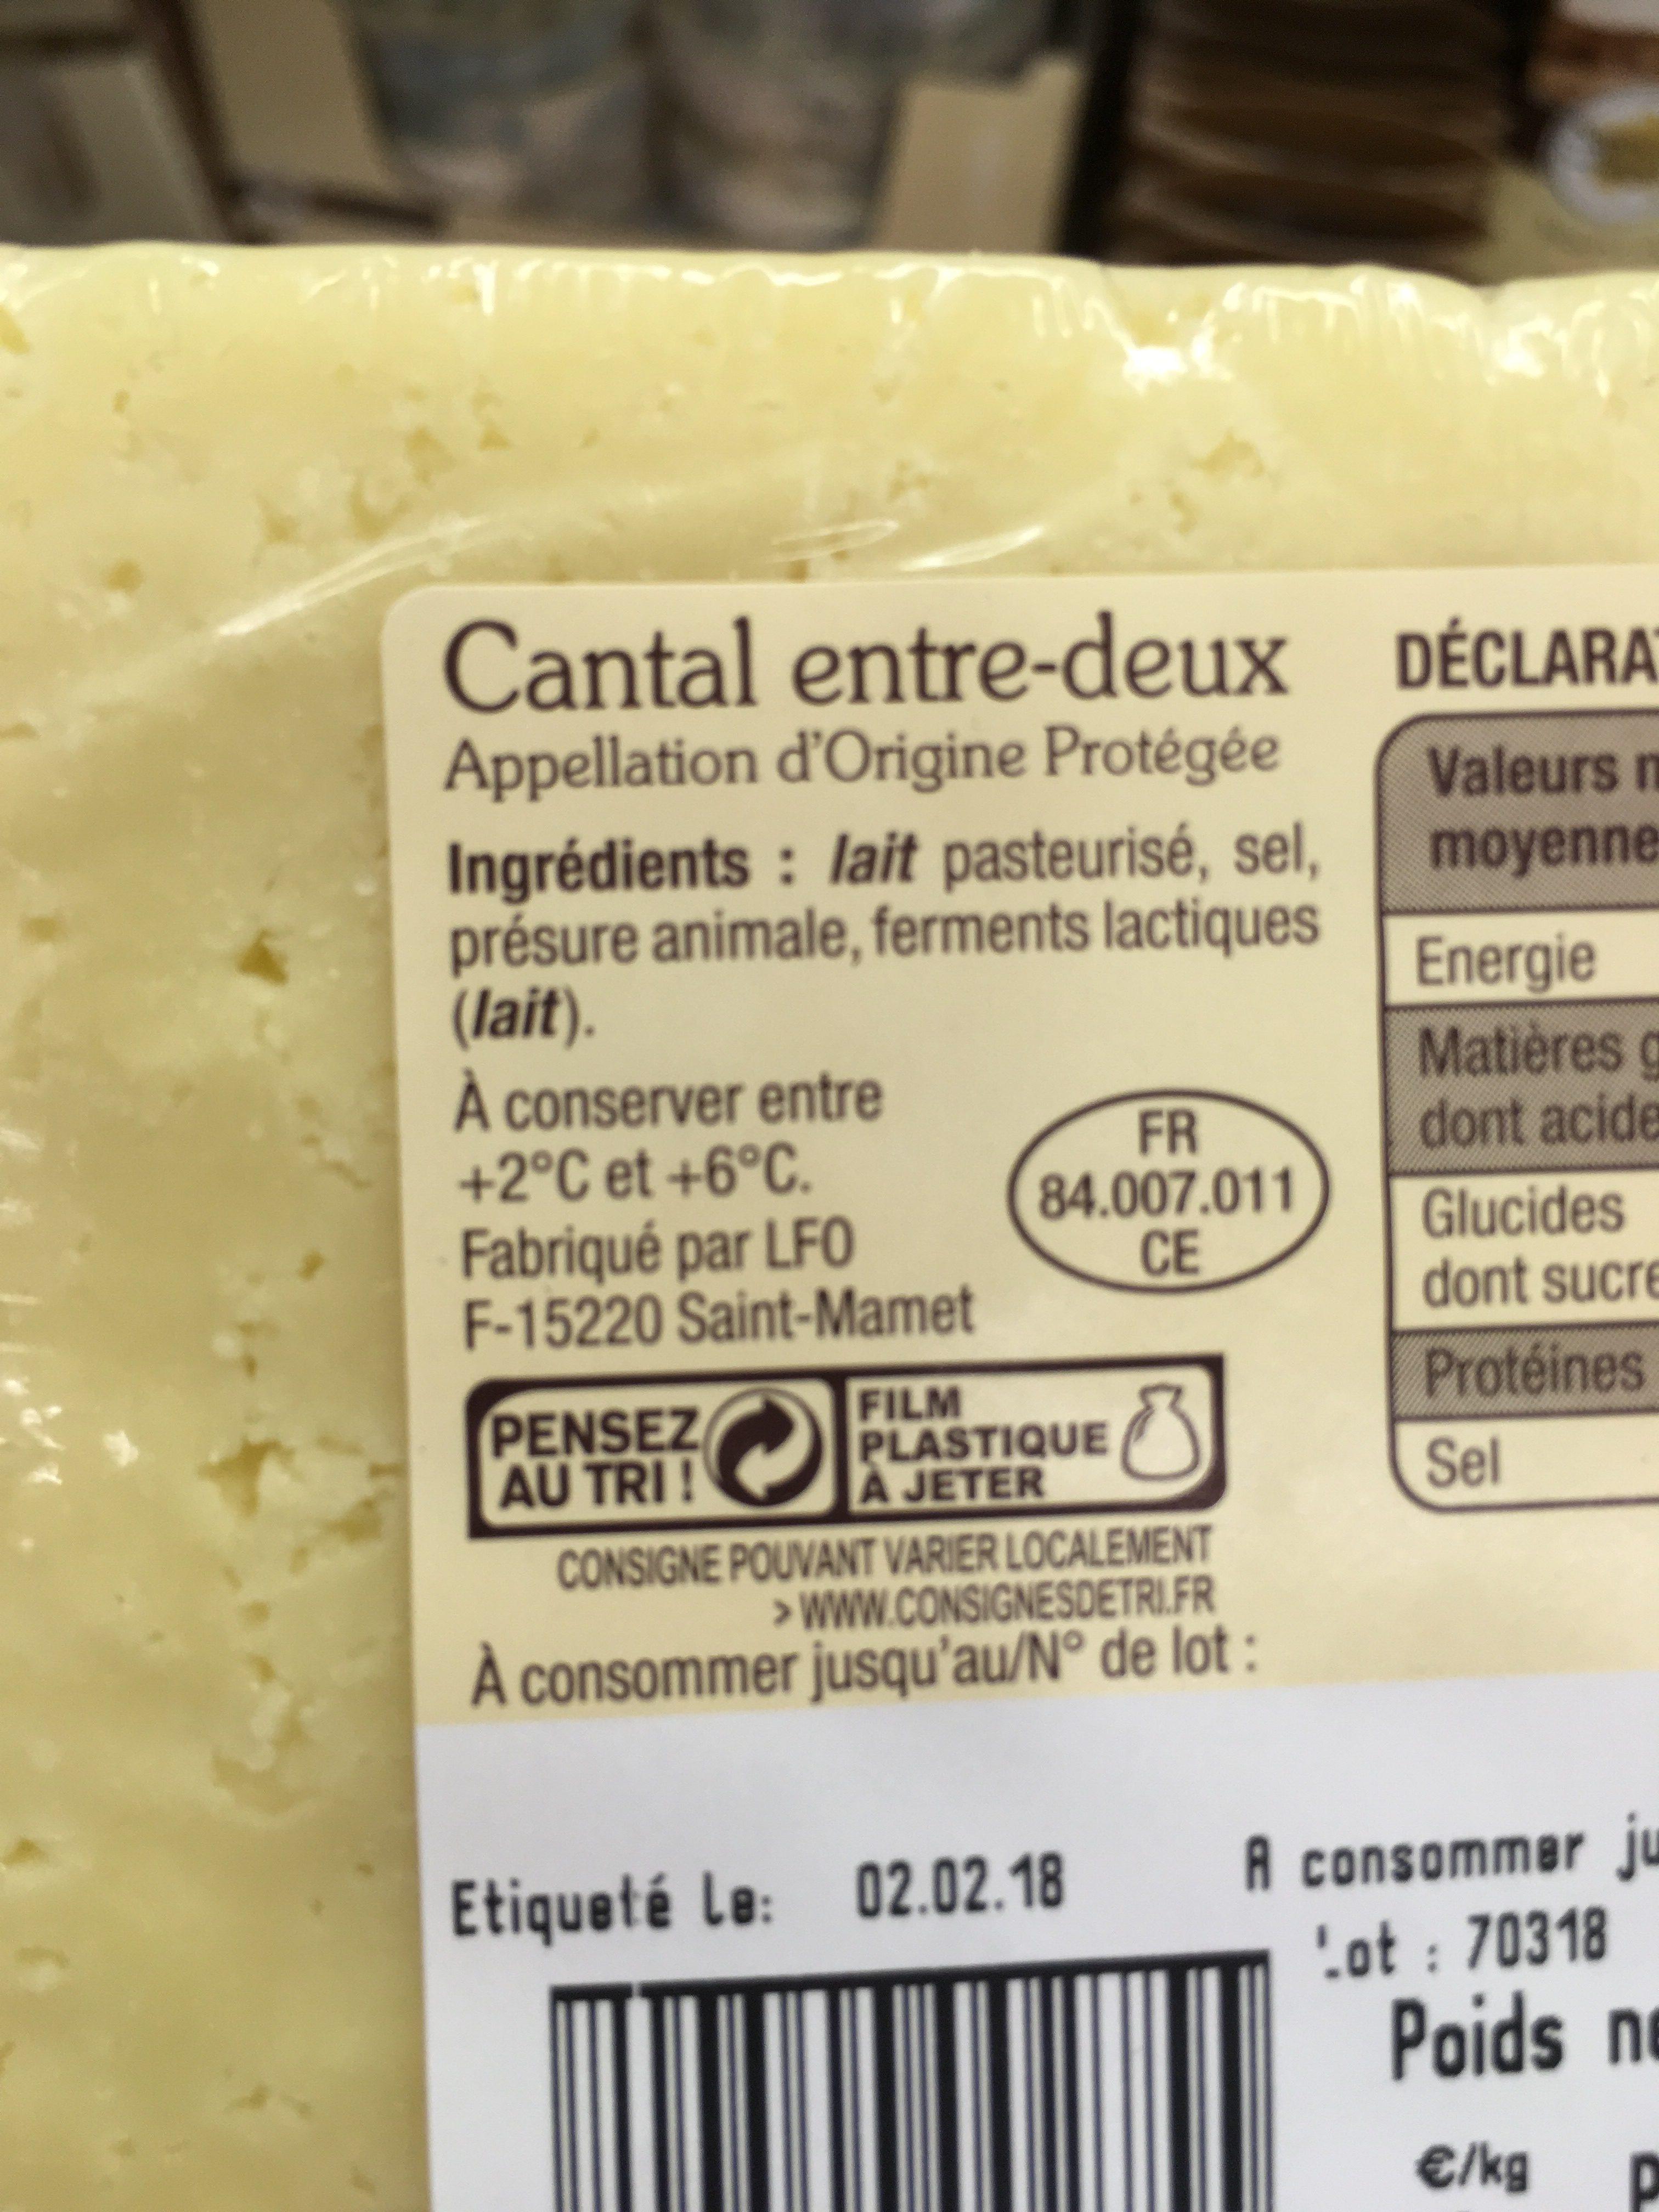 Cantal entre deux - Ingrediënten